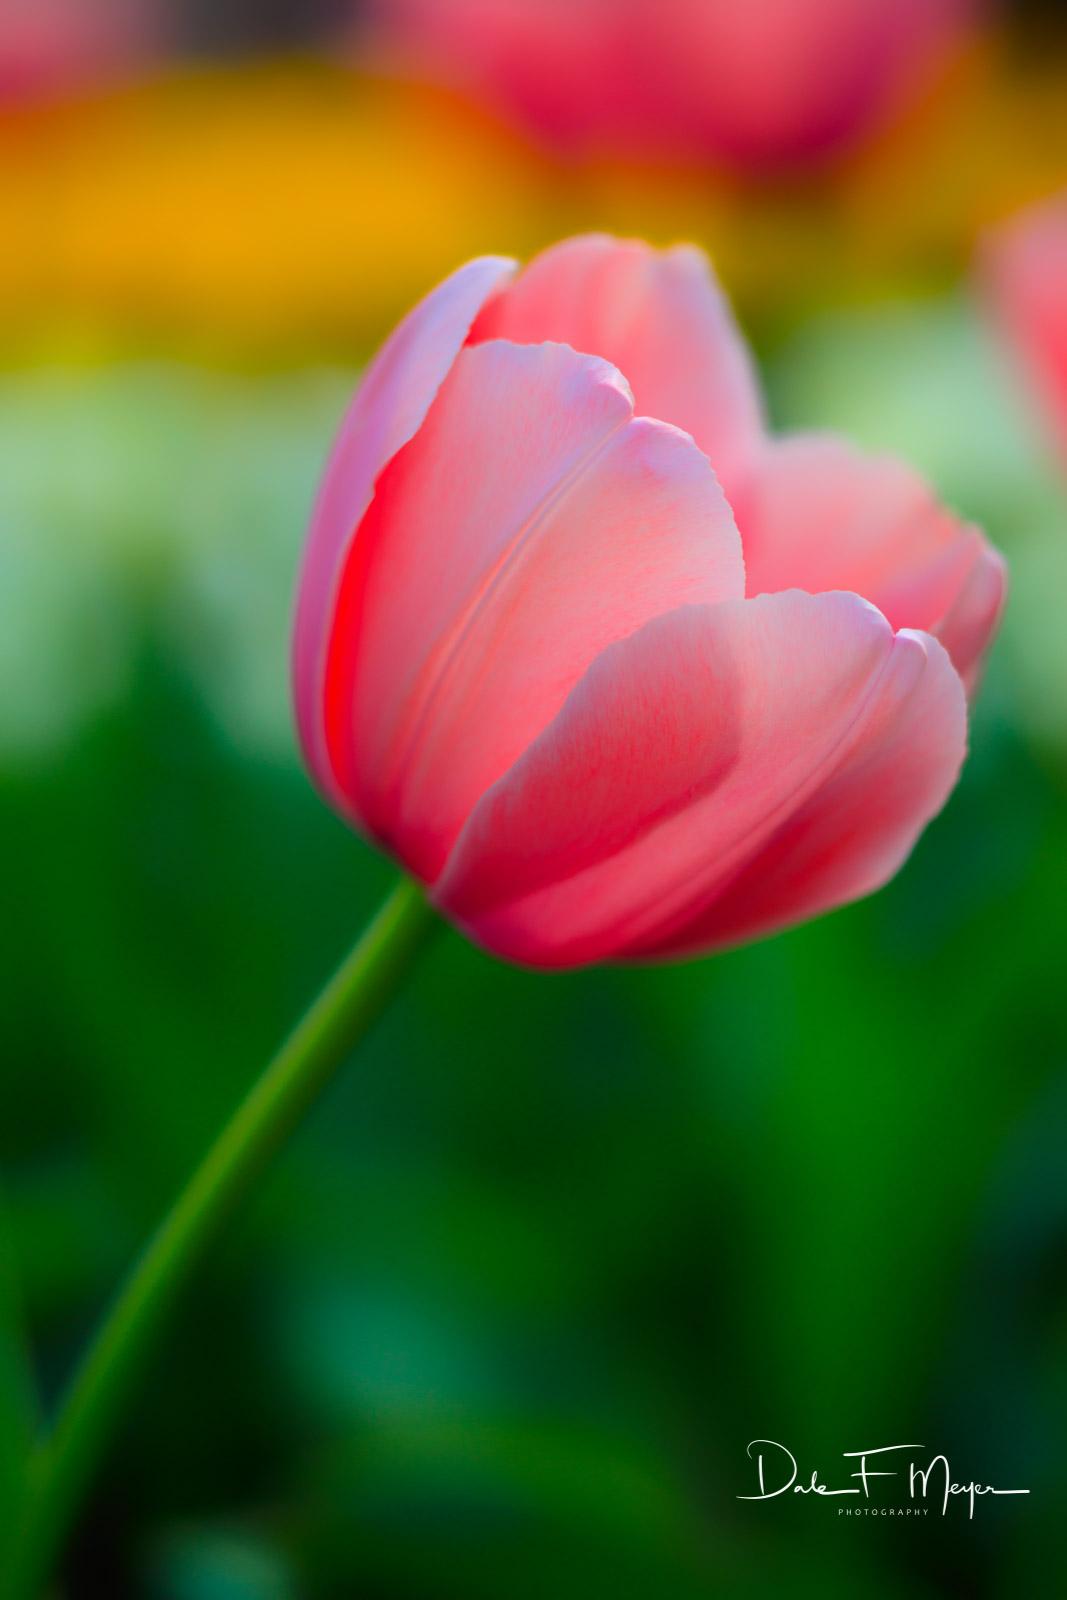 Flora Gallerie,Garvan Woodland Gardens Hot Springs Arkansas,Spring 2016,Spring Tulip,flower, photo